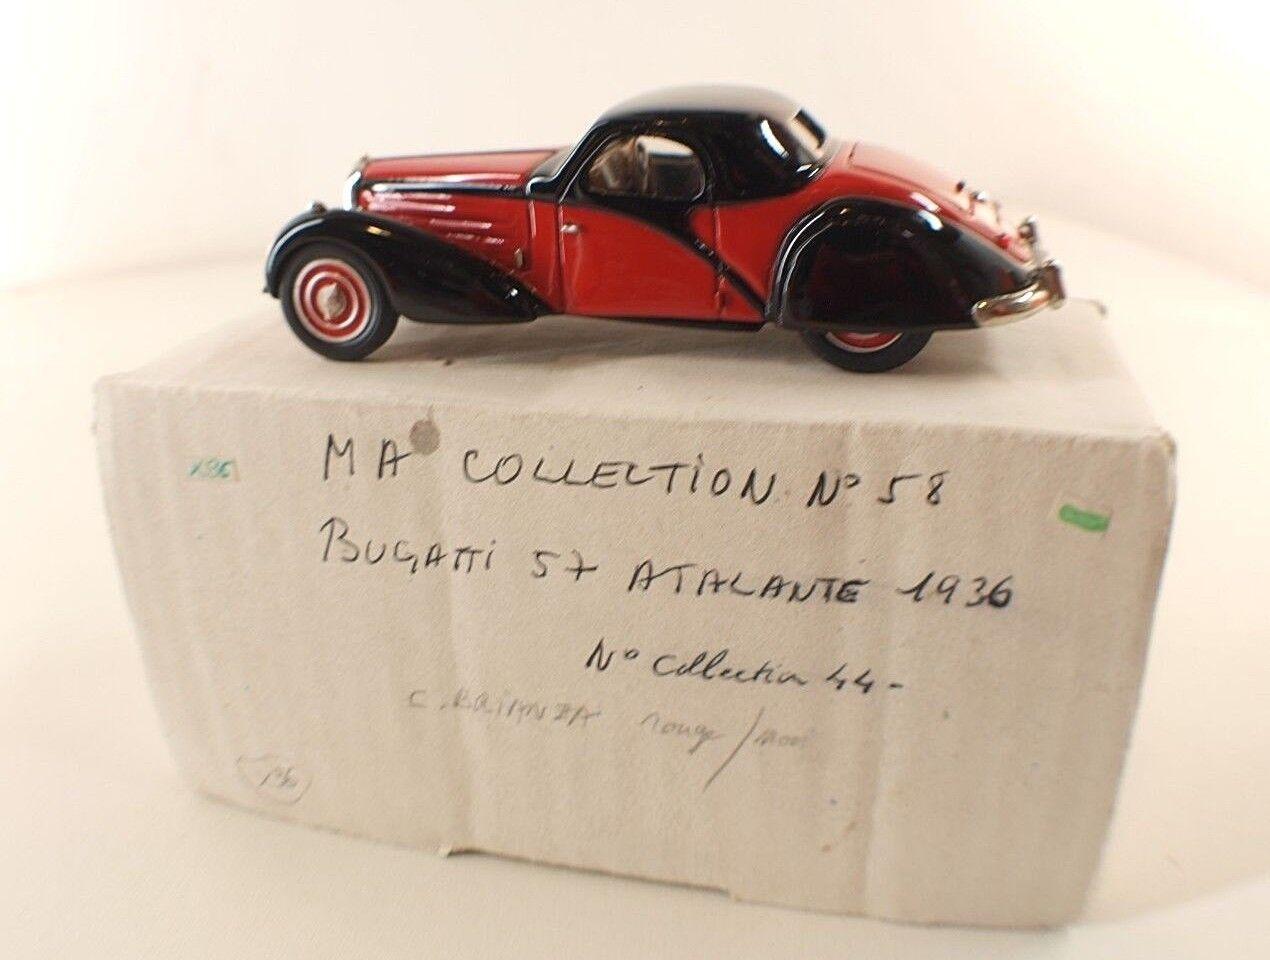 Ma Collection (Suisse)  n° 58 Bugatti  57 Atalante 1936 Limited Ed n°44 1 43  livraison gratuite